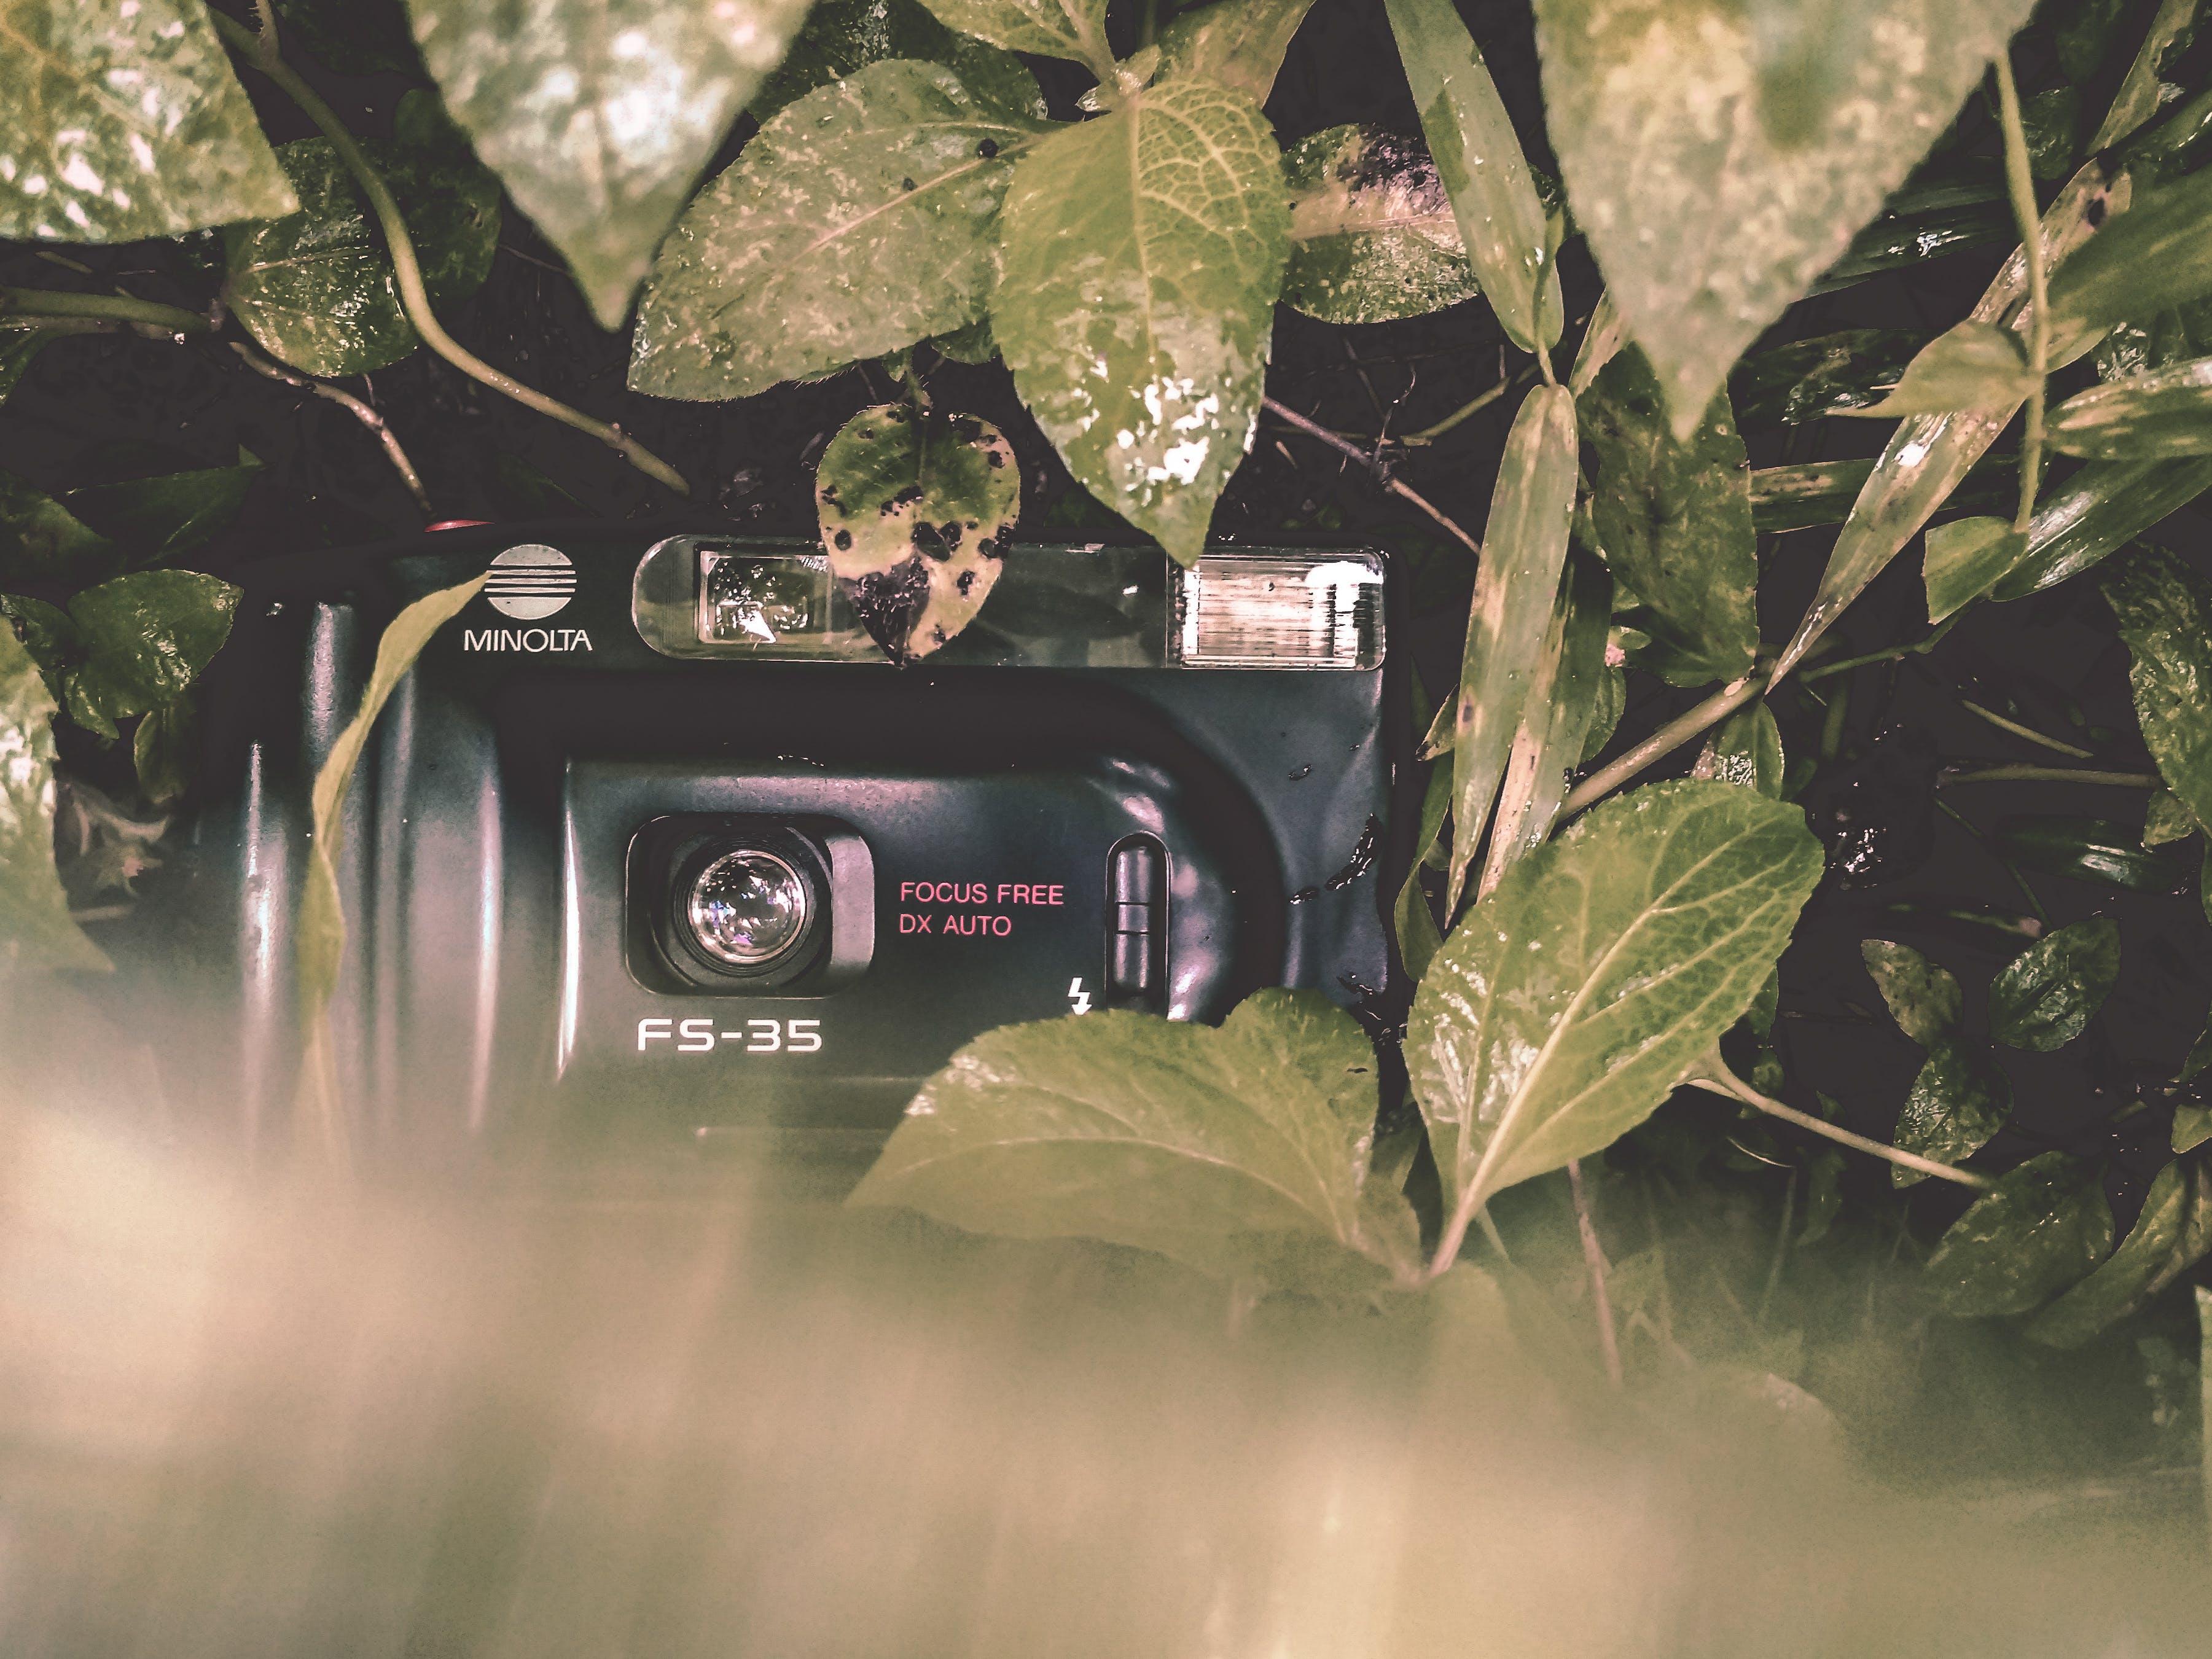 Black Minolta Film Camera Covered With Leaves